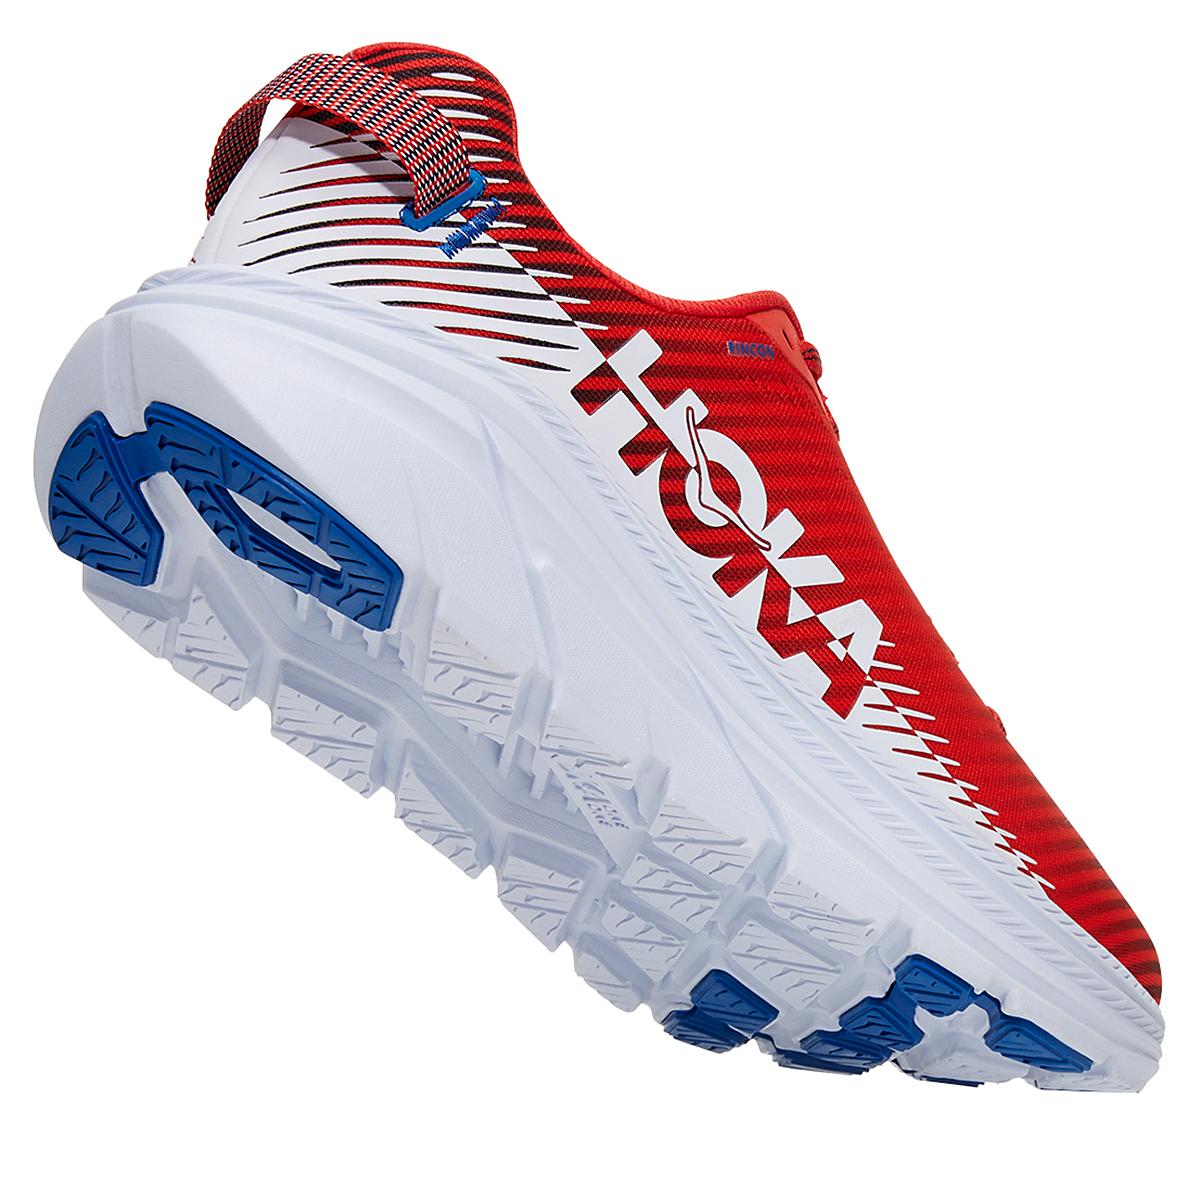 Men's Hoka One One Rincon 2 Running Shoe - Color: Fiesta/Turkish White - Size: 7 - Width: Regular, Fiesta/Turkish White, large, image 4